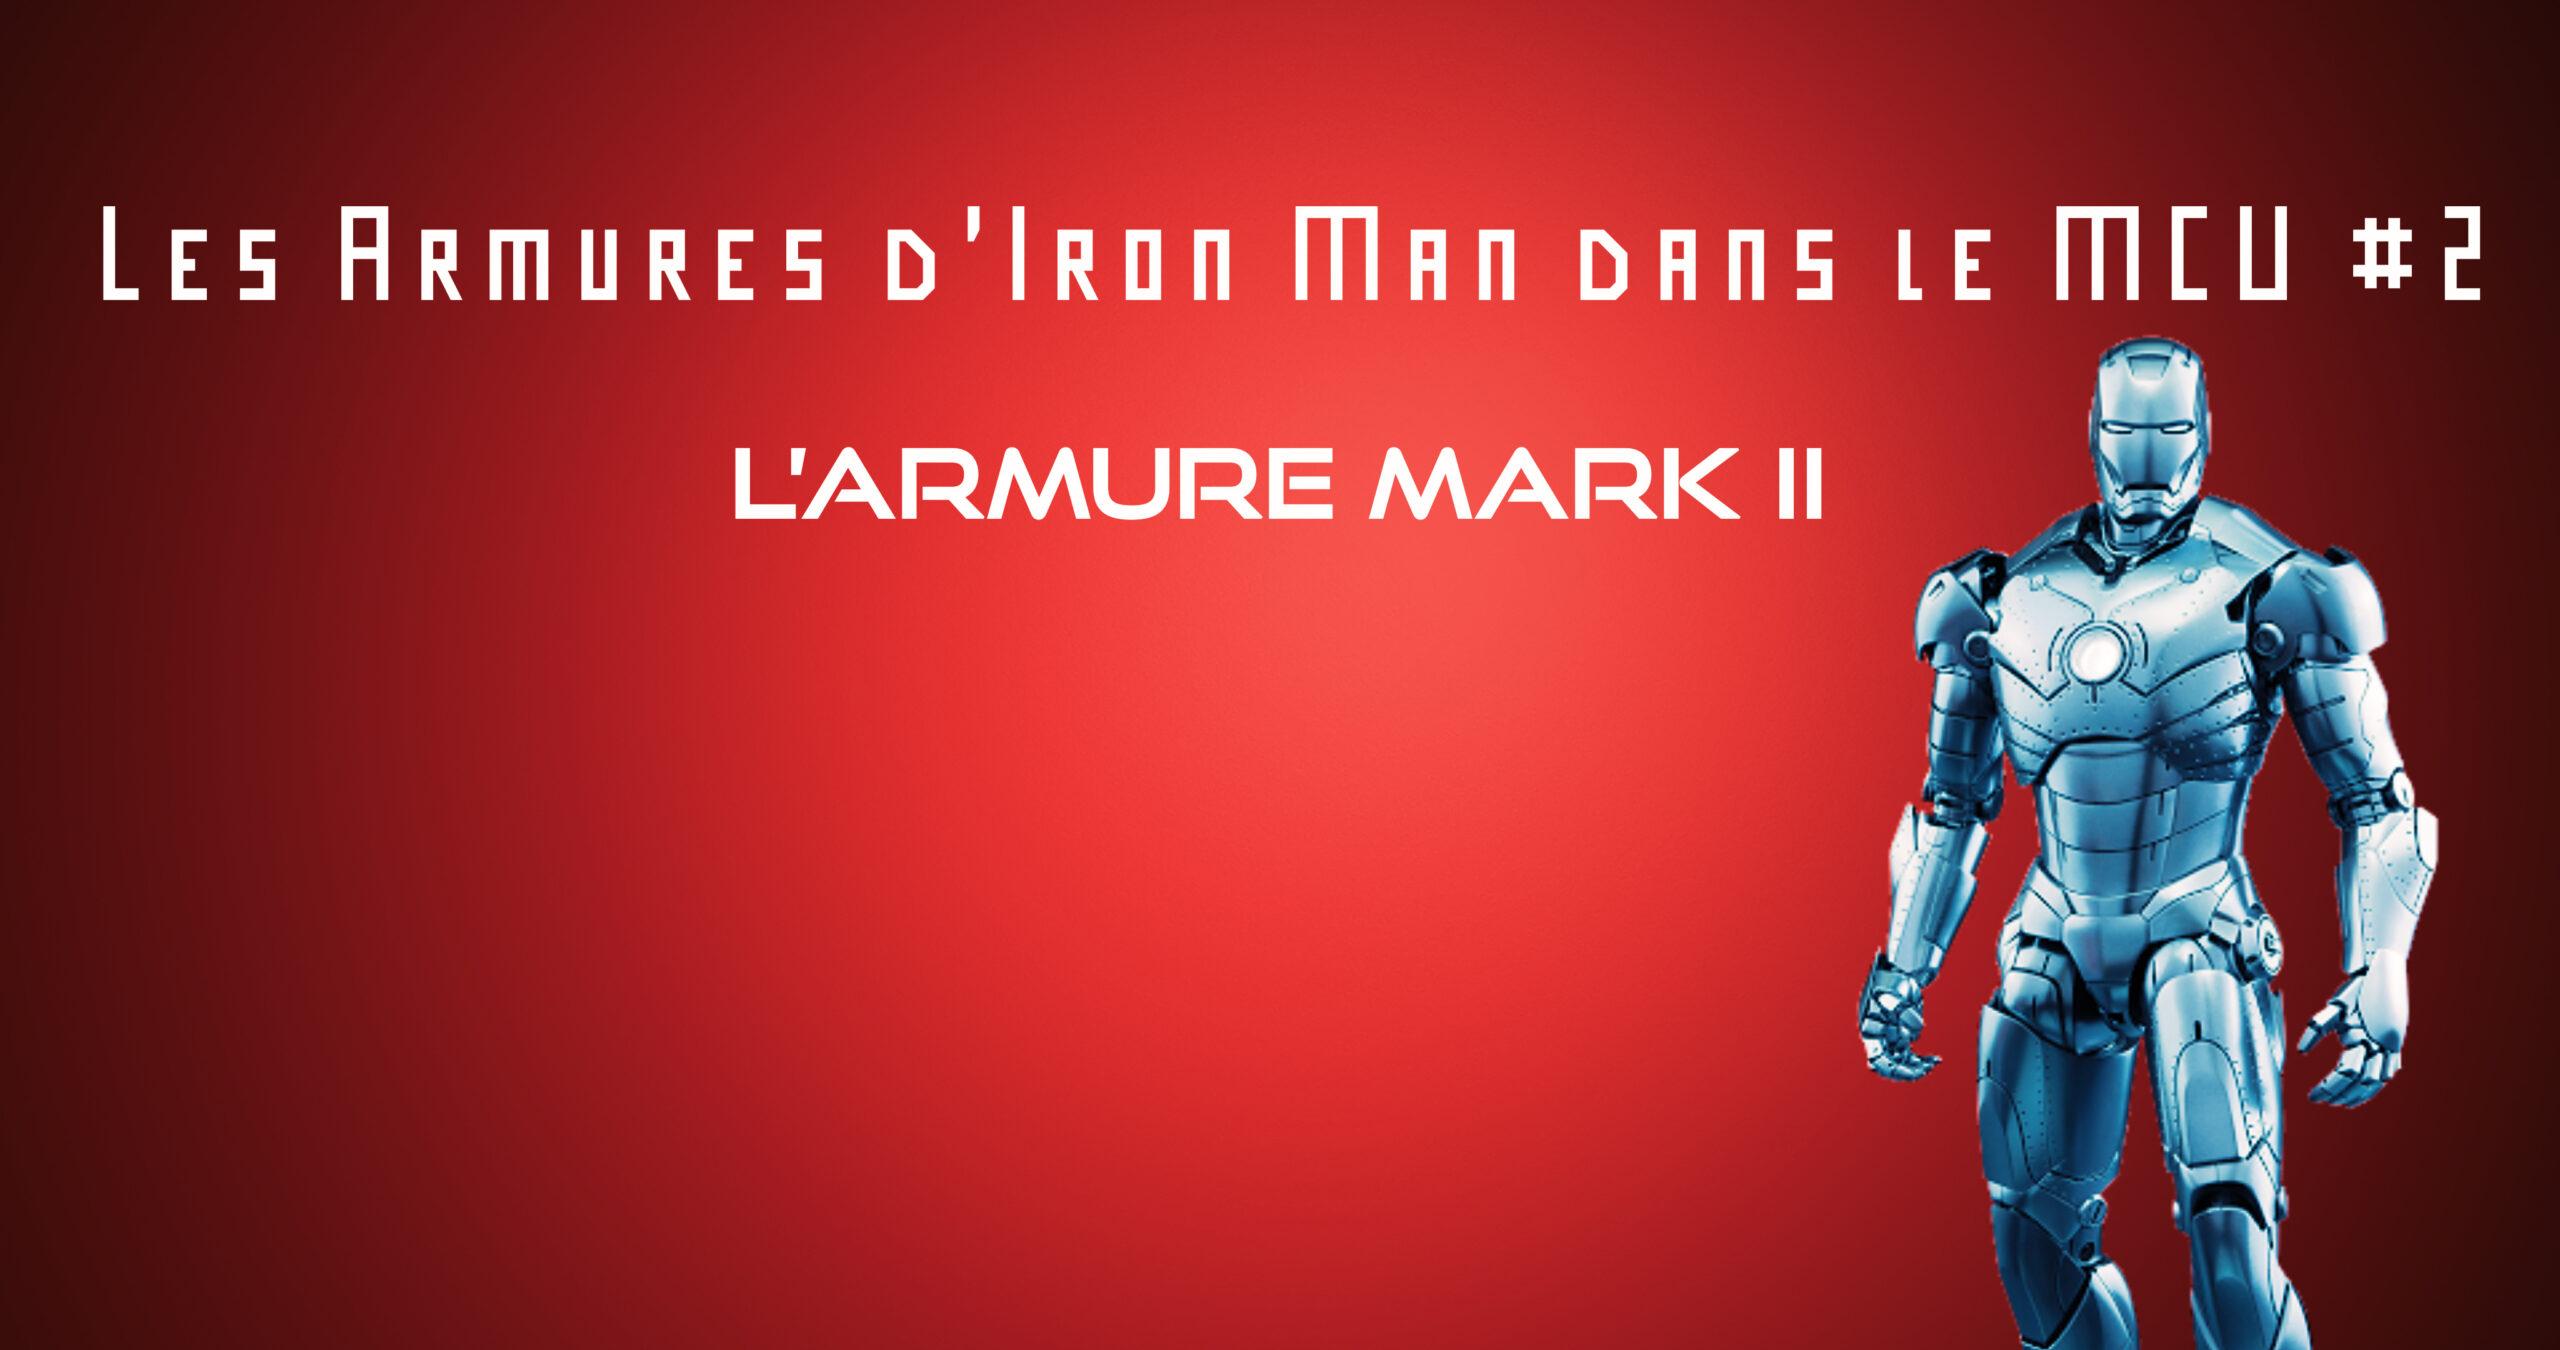 L'armure Mark II – Les Armures d'Iron Man dans le MCU #2